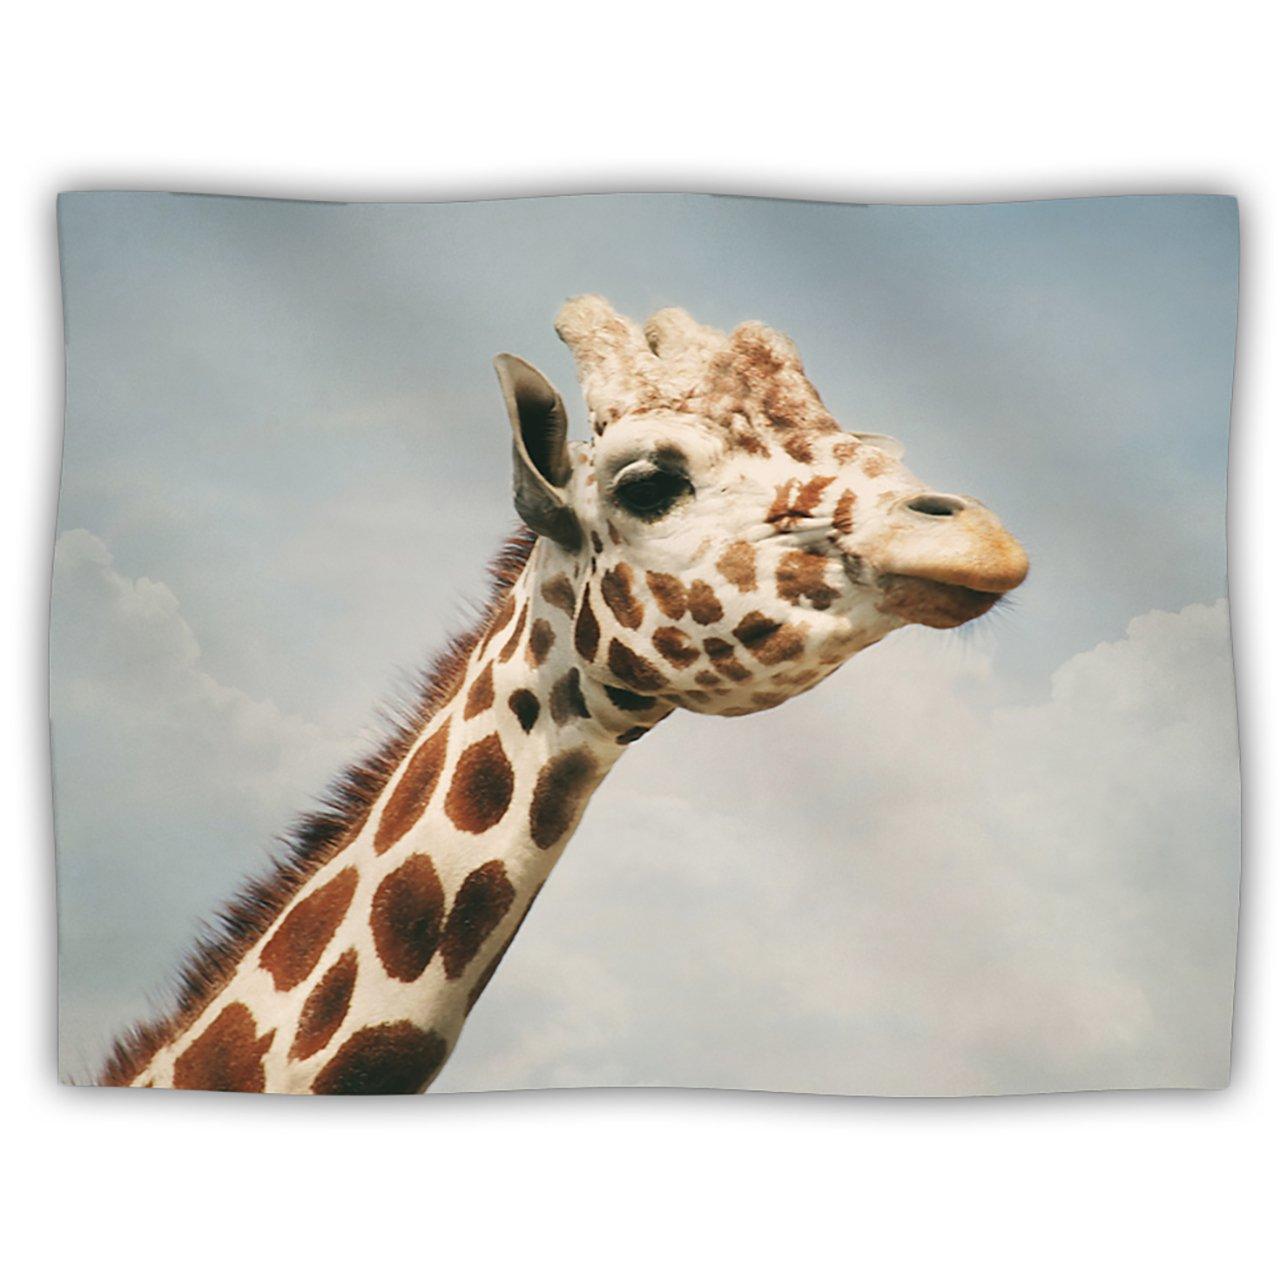 Kess InHouse Angie Turner ''Giraffe'' Animal Pet Blanket, 40 by 30-Inch